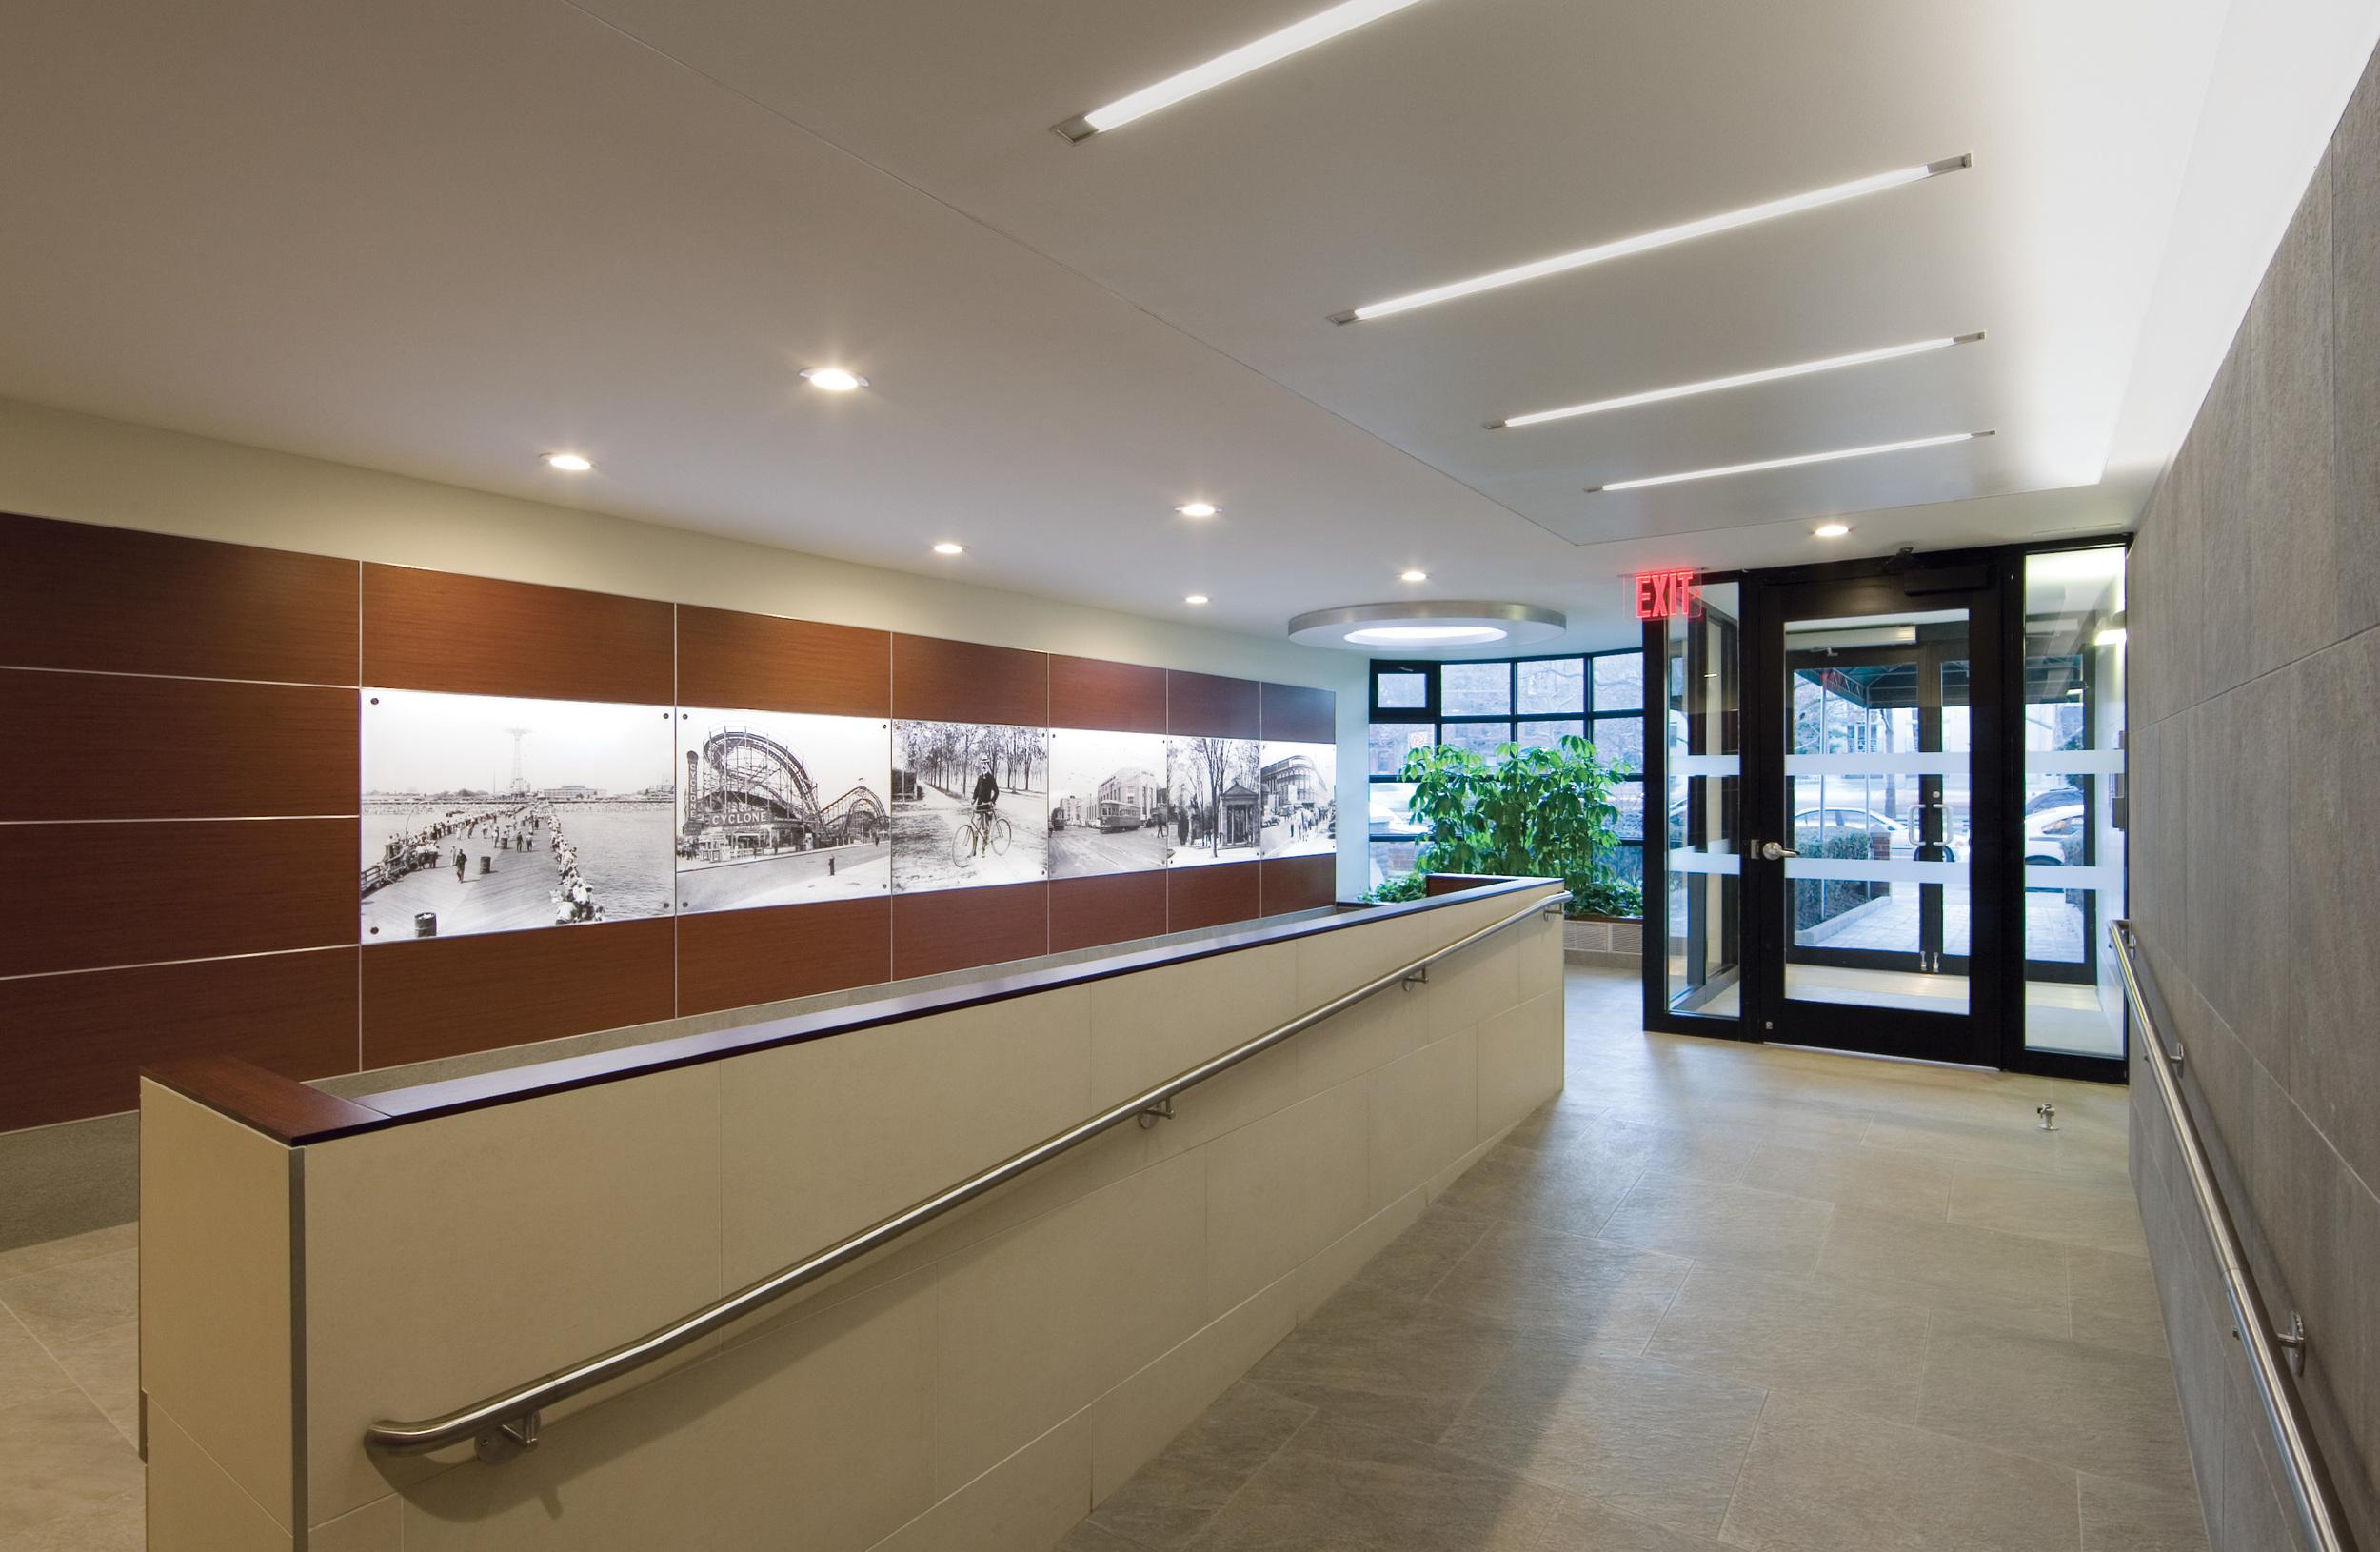 brooklyn lobby 2.jpg